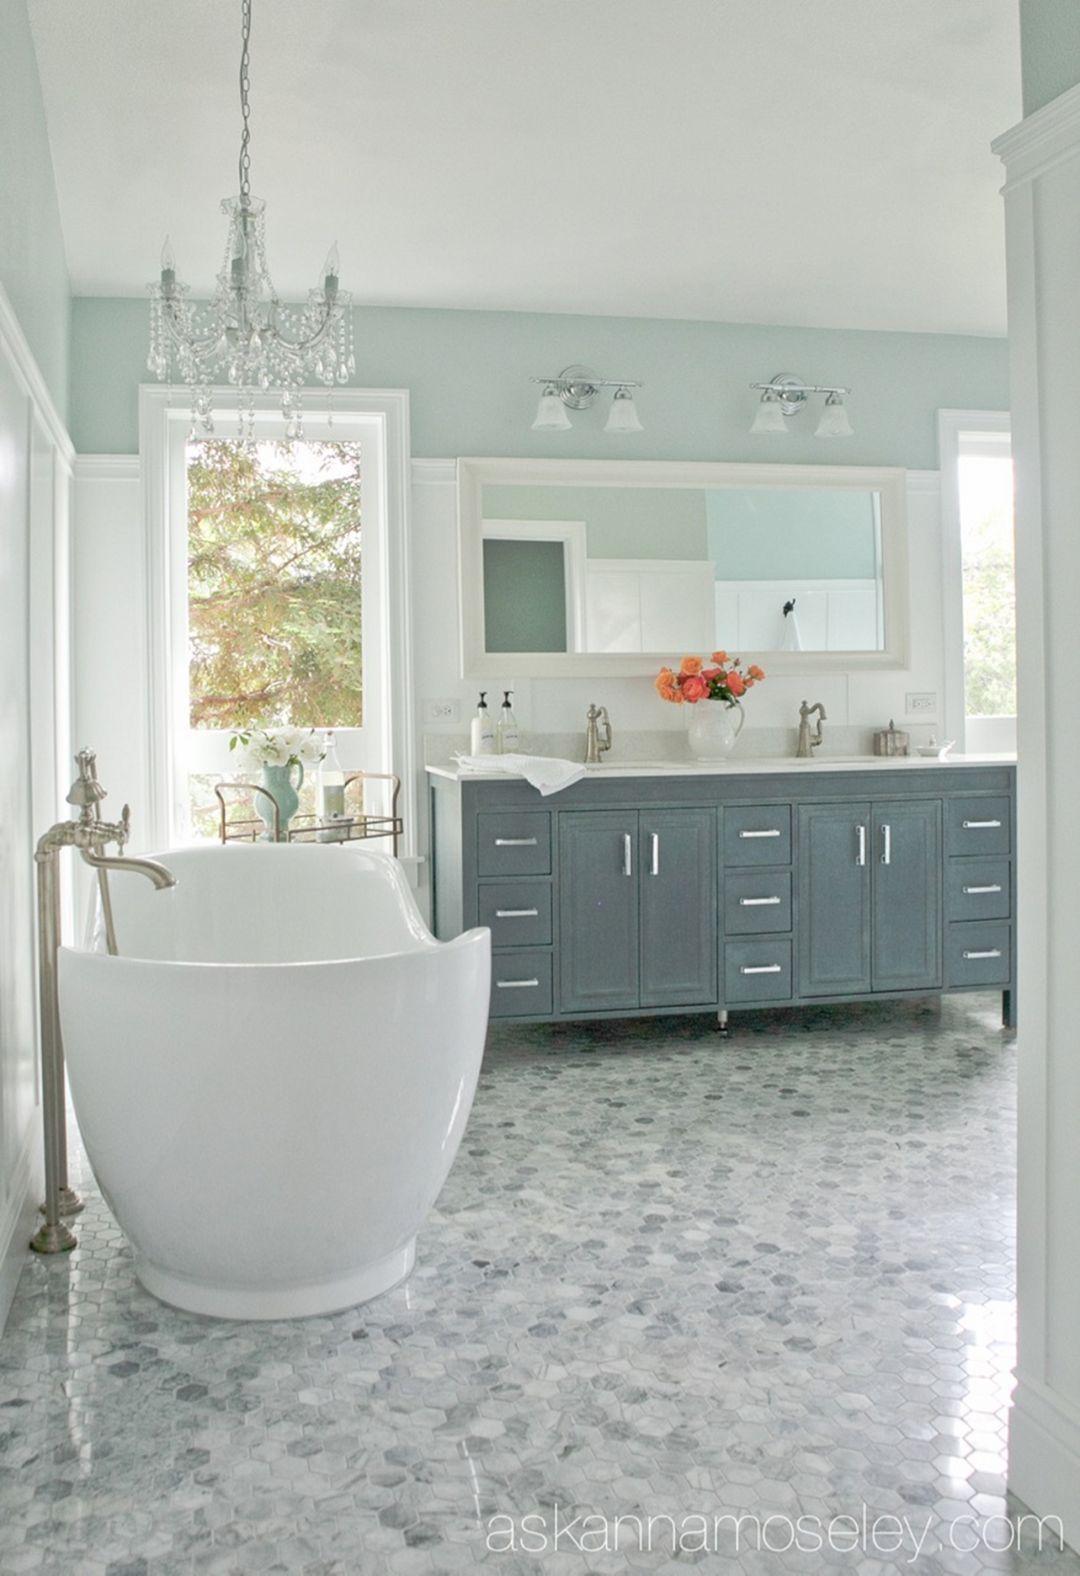 Breathtaking 65+ Luxurious Master Bathroom Design Ideas For Amazing ...